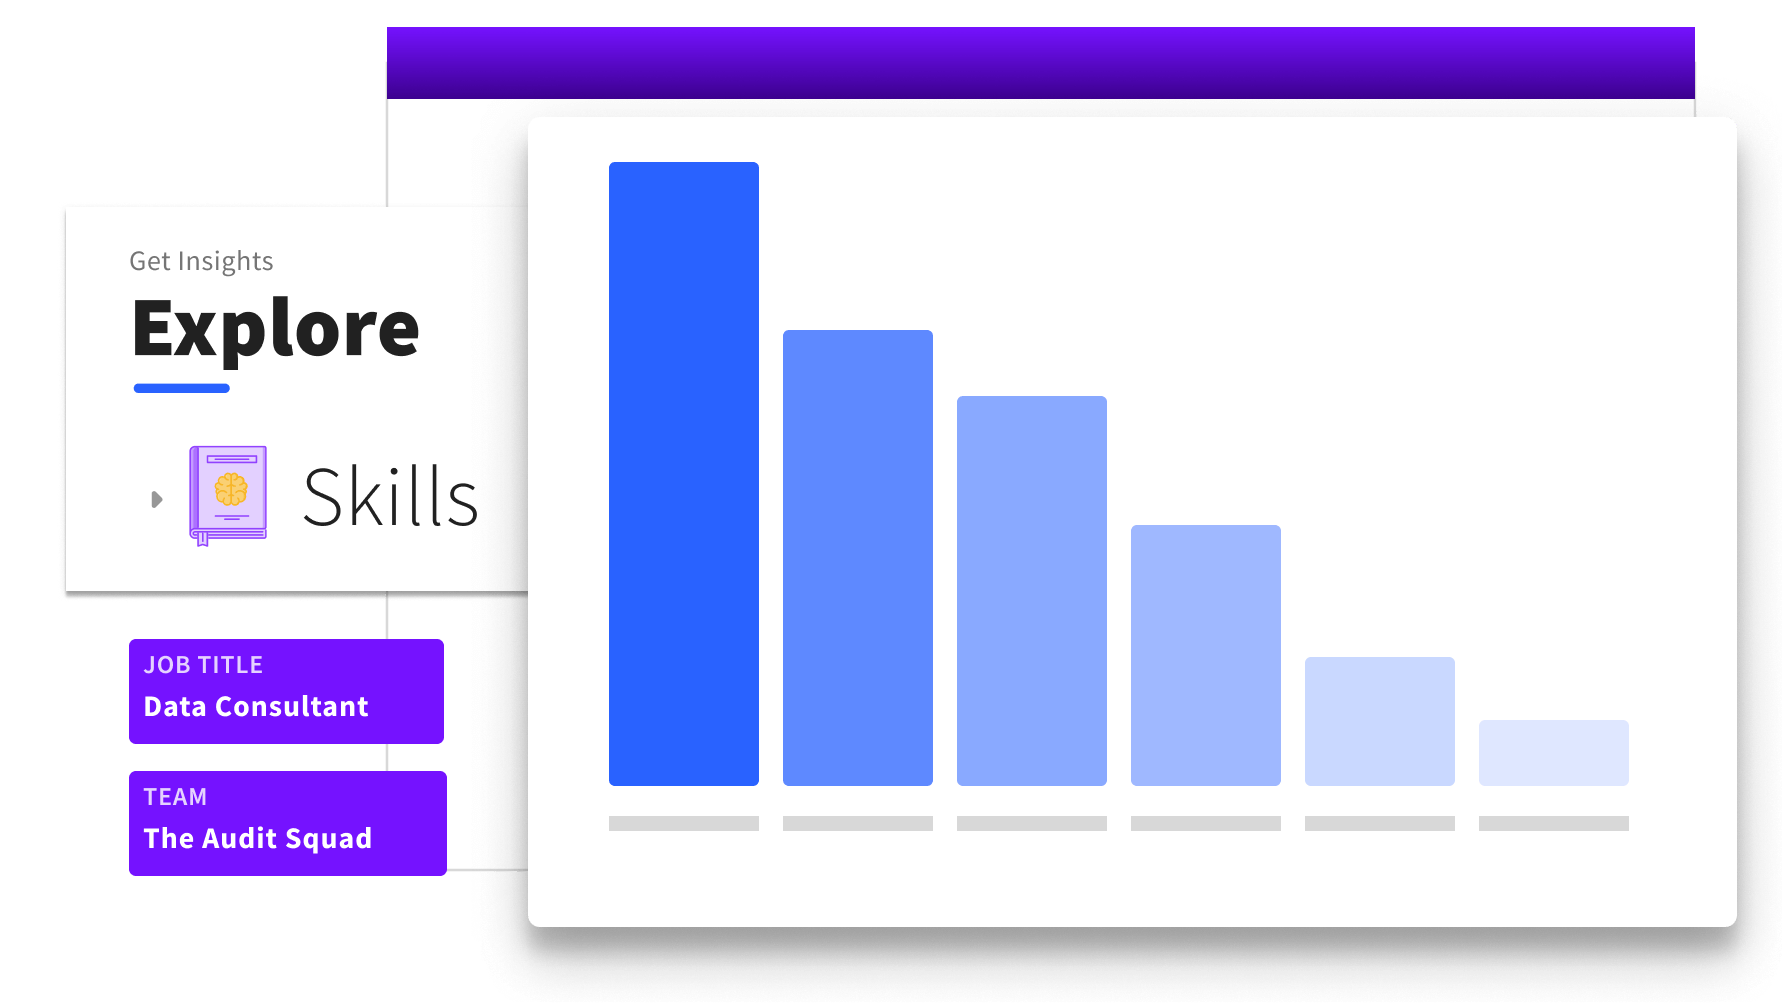 Sift Explore feature skills breakdown